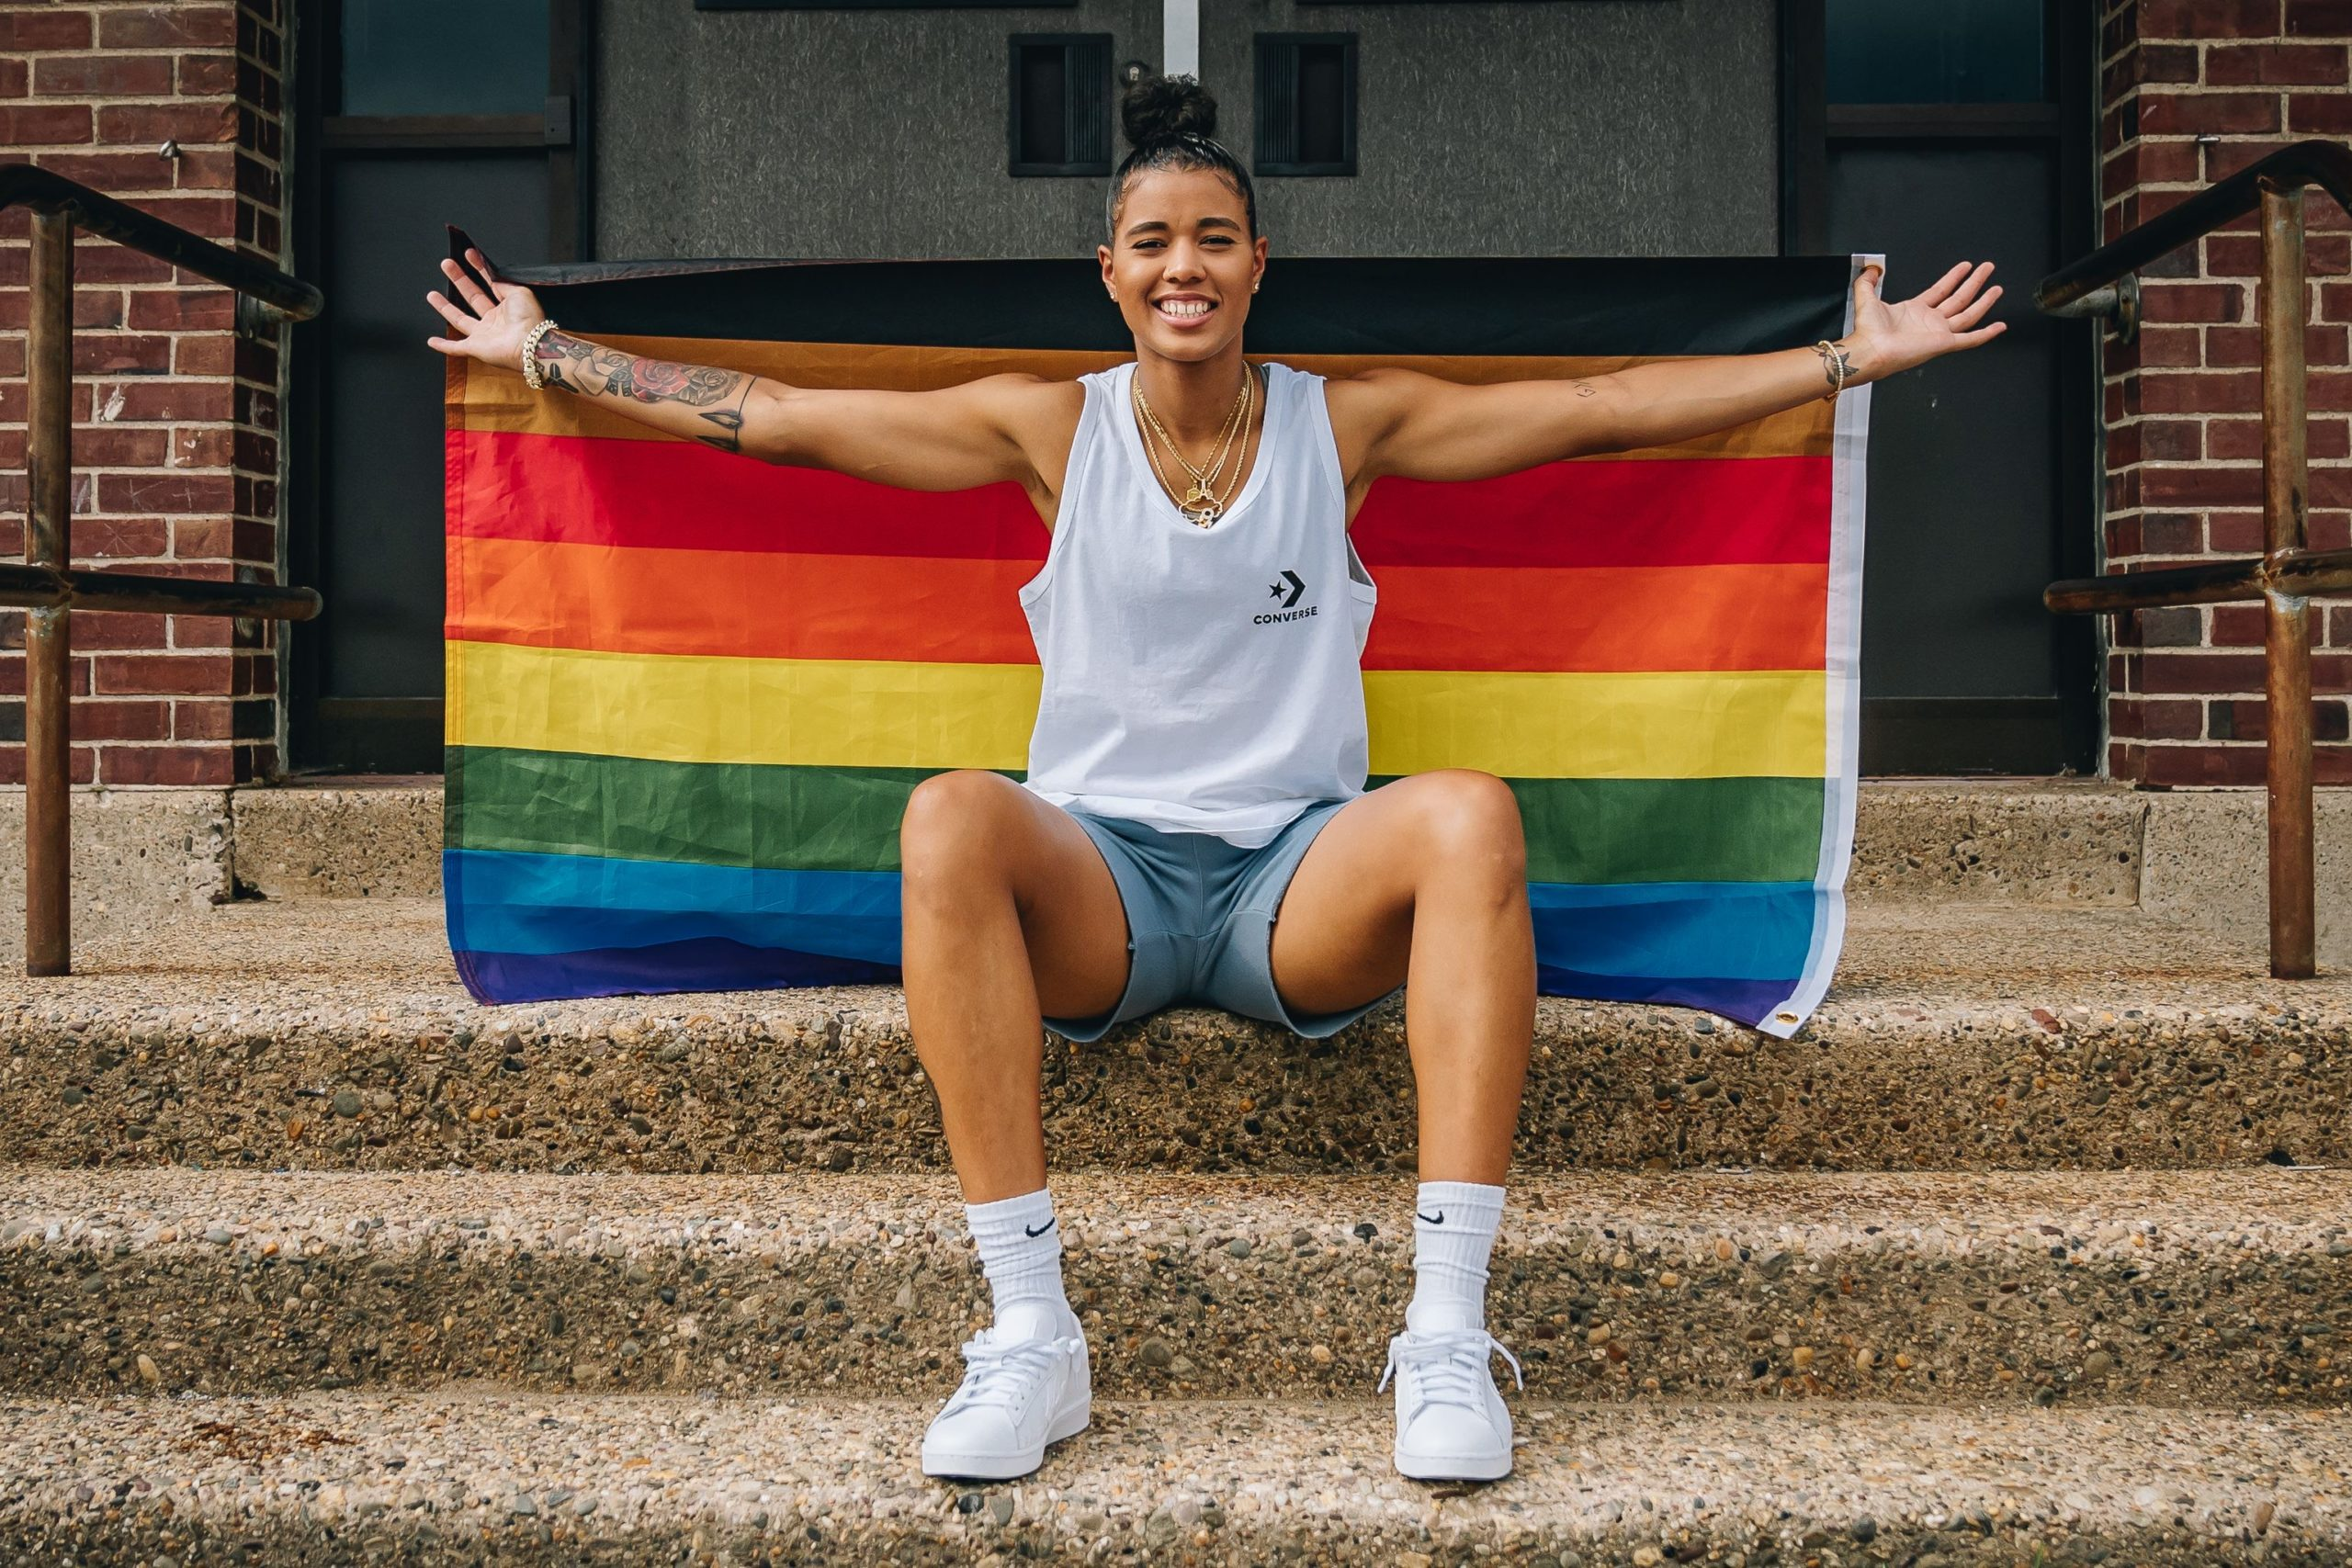 Natasha Cloud featured in Philadelphia 76ers' Pride photo series - The Next